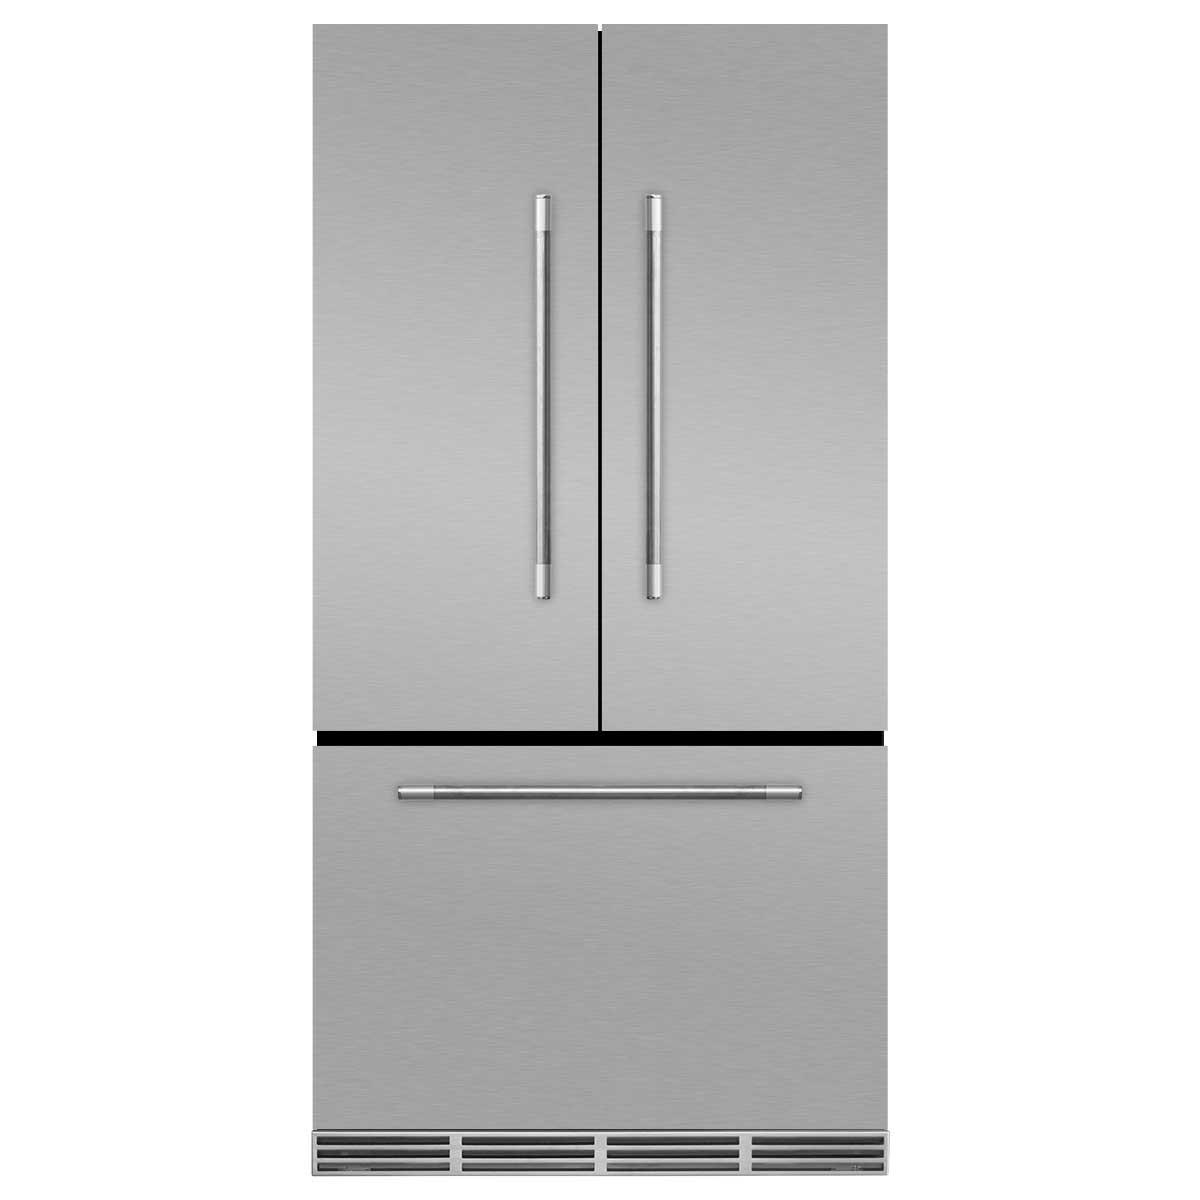 Marvel Mercury French Door Counter-Depth Refrigerator